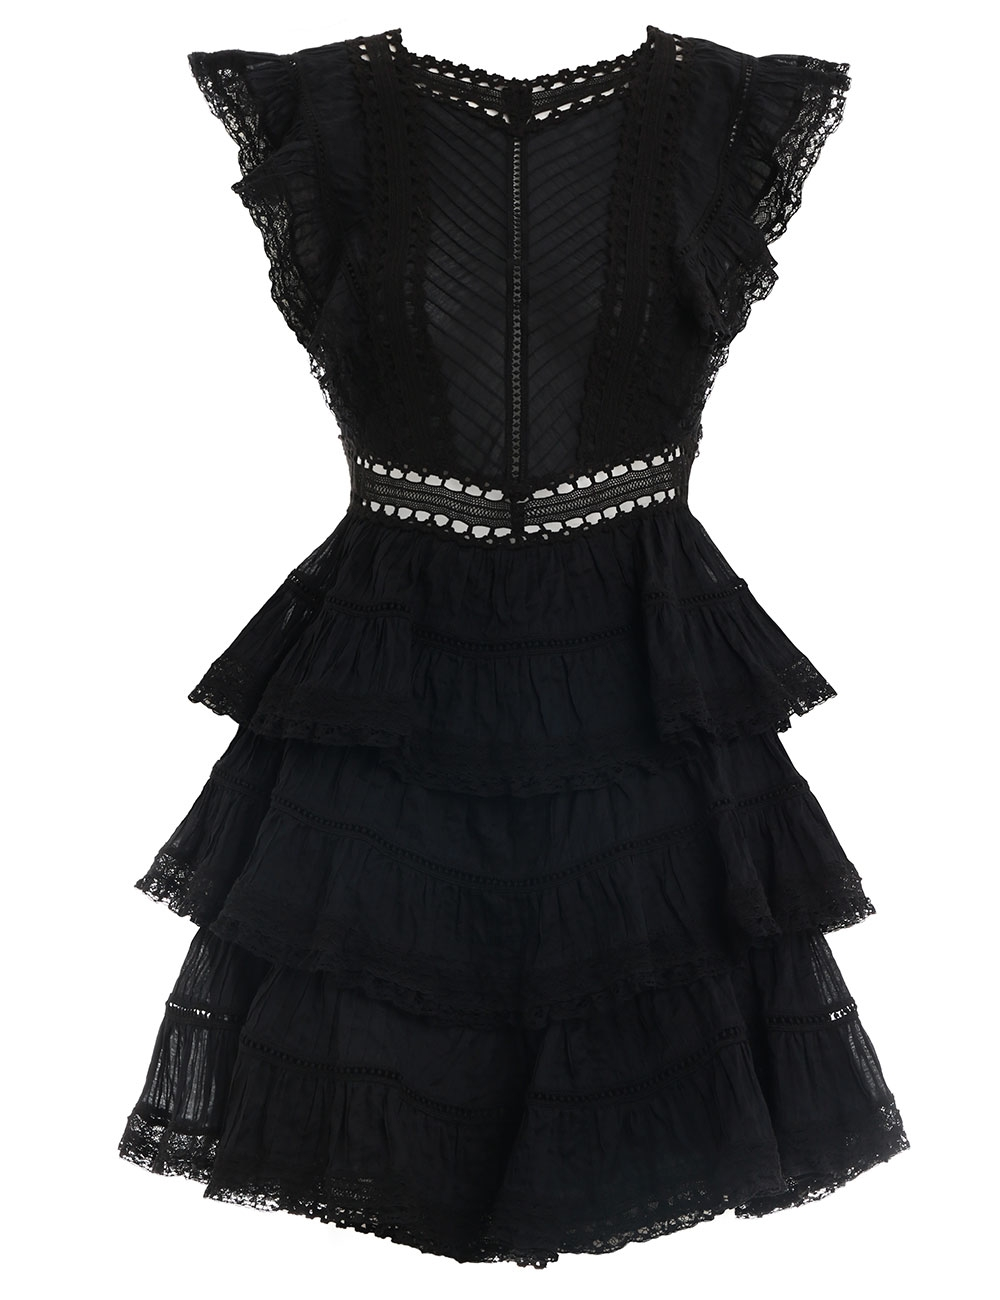 Juniper Pintuck Frill Dress